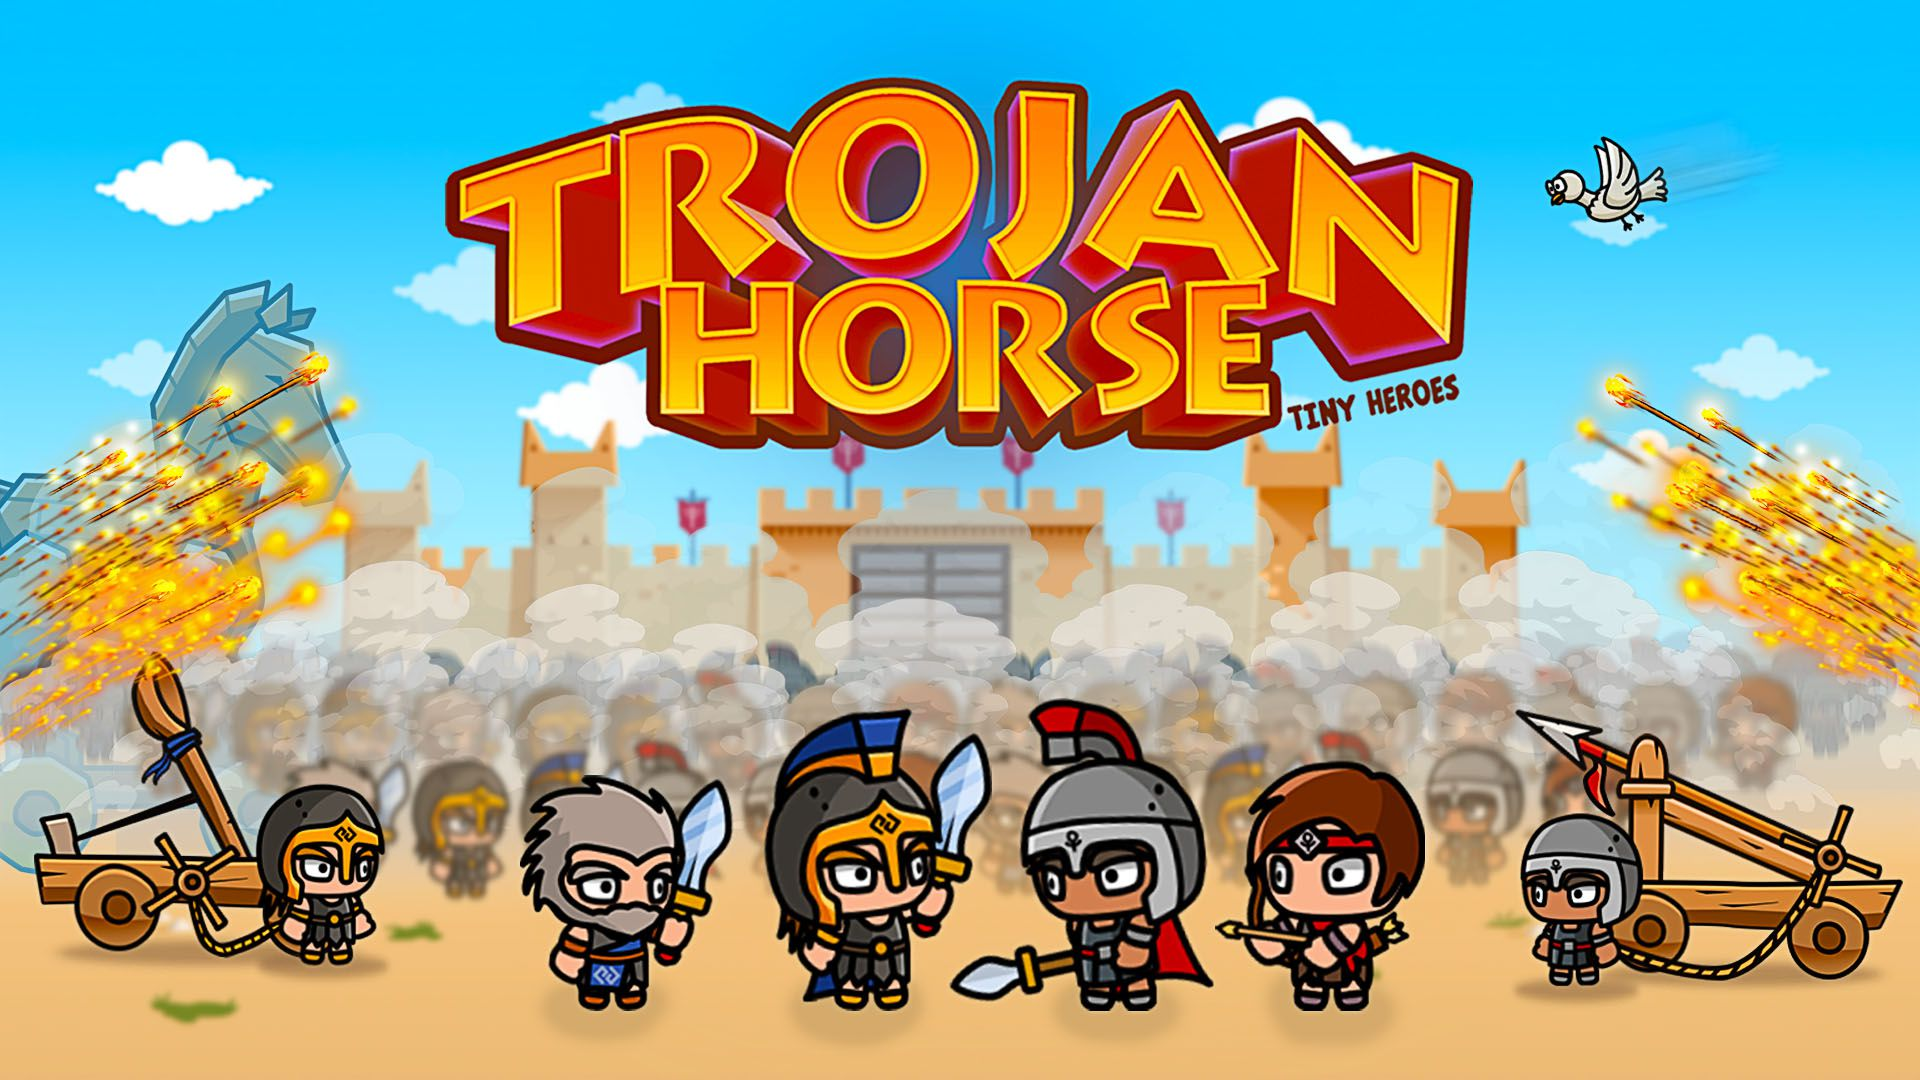 wallpaper-trojan-horse-1920x1080